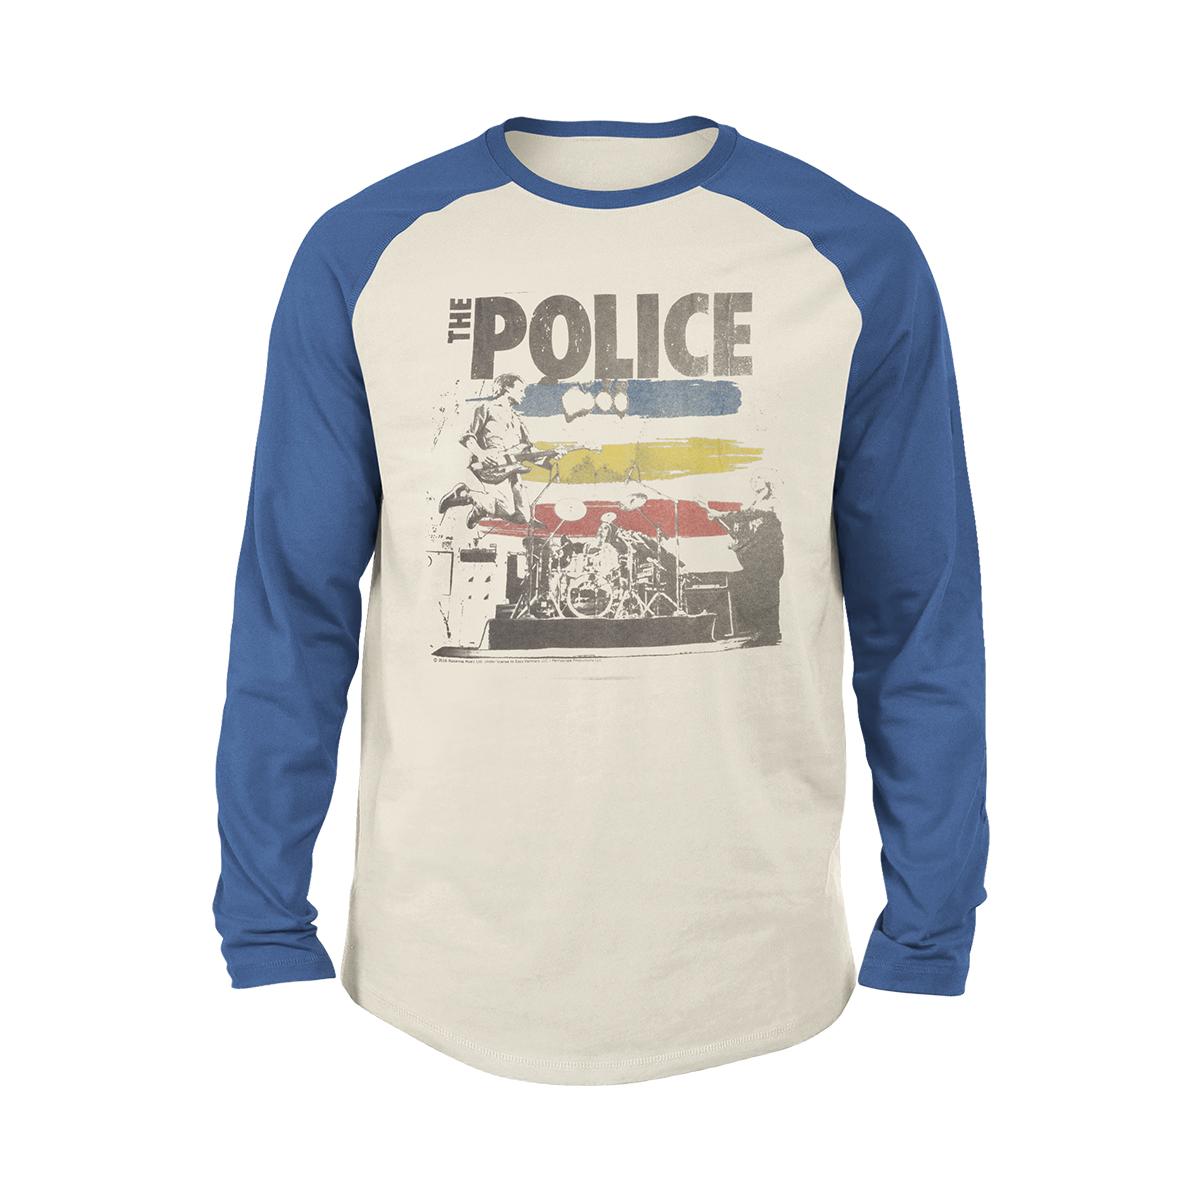 The Police Concert Photo Long Sleeve Raglan T-shirt